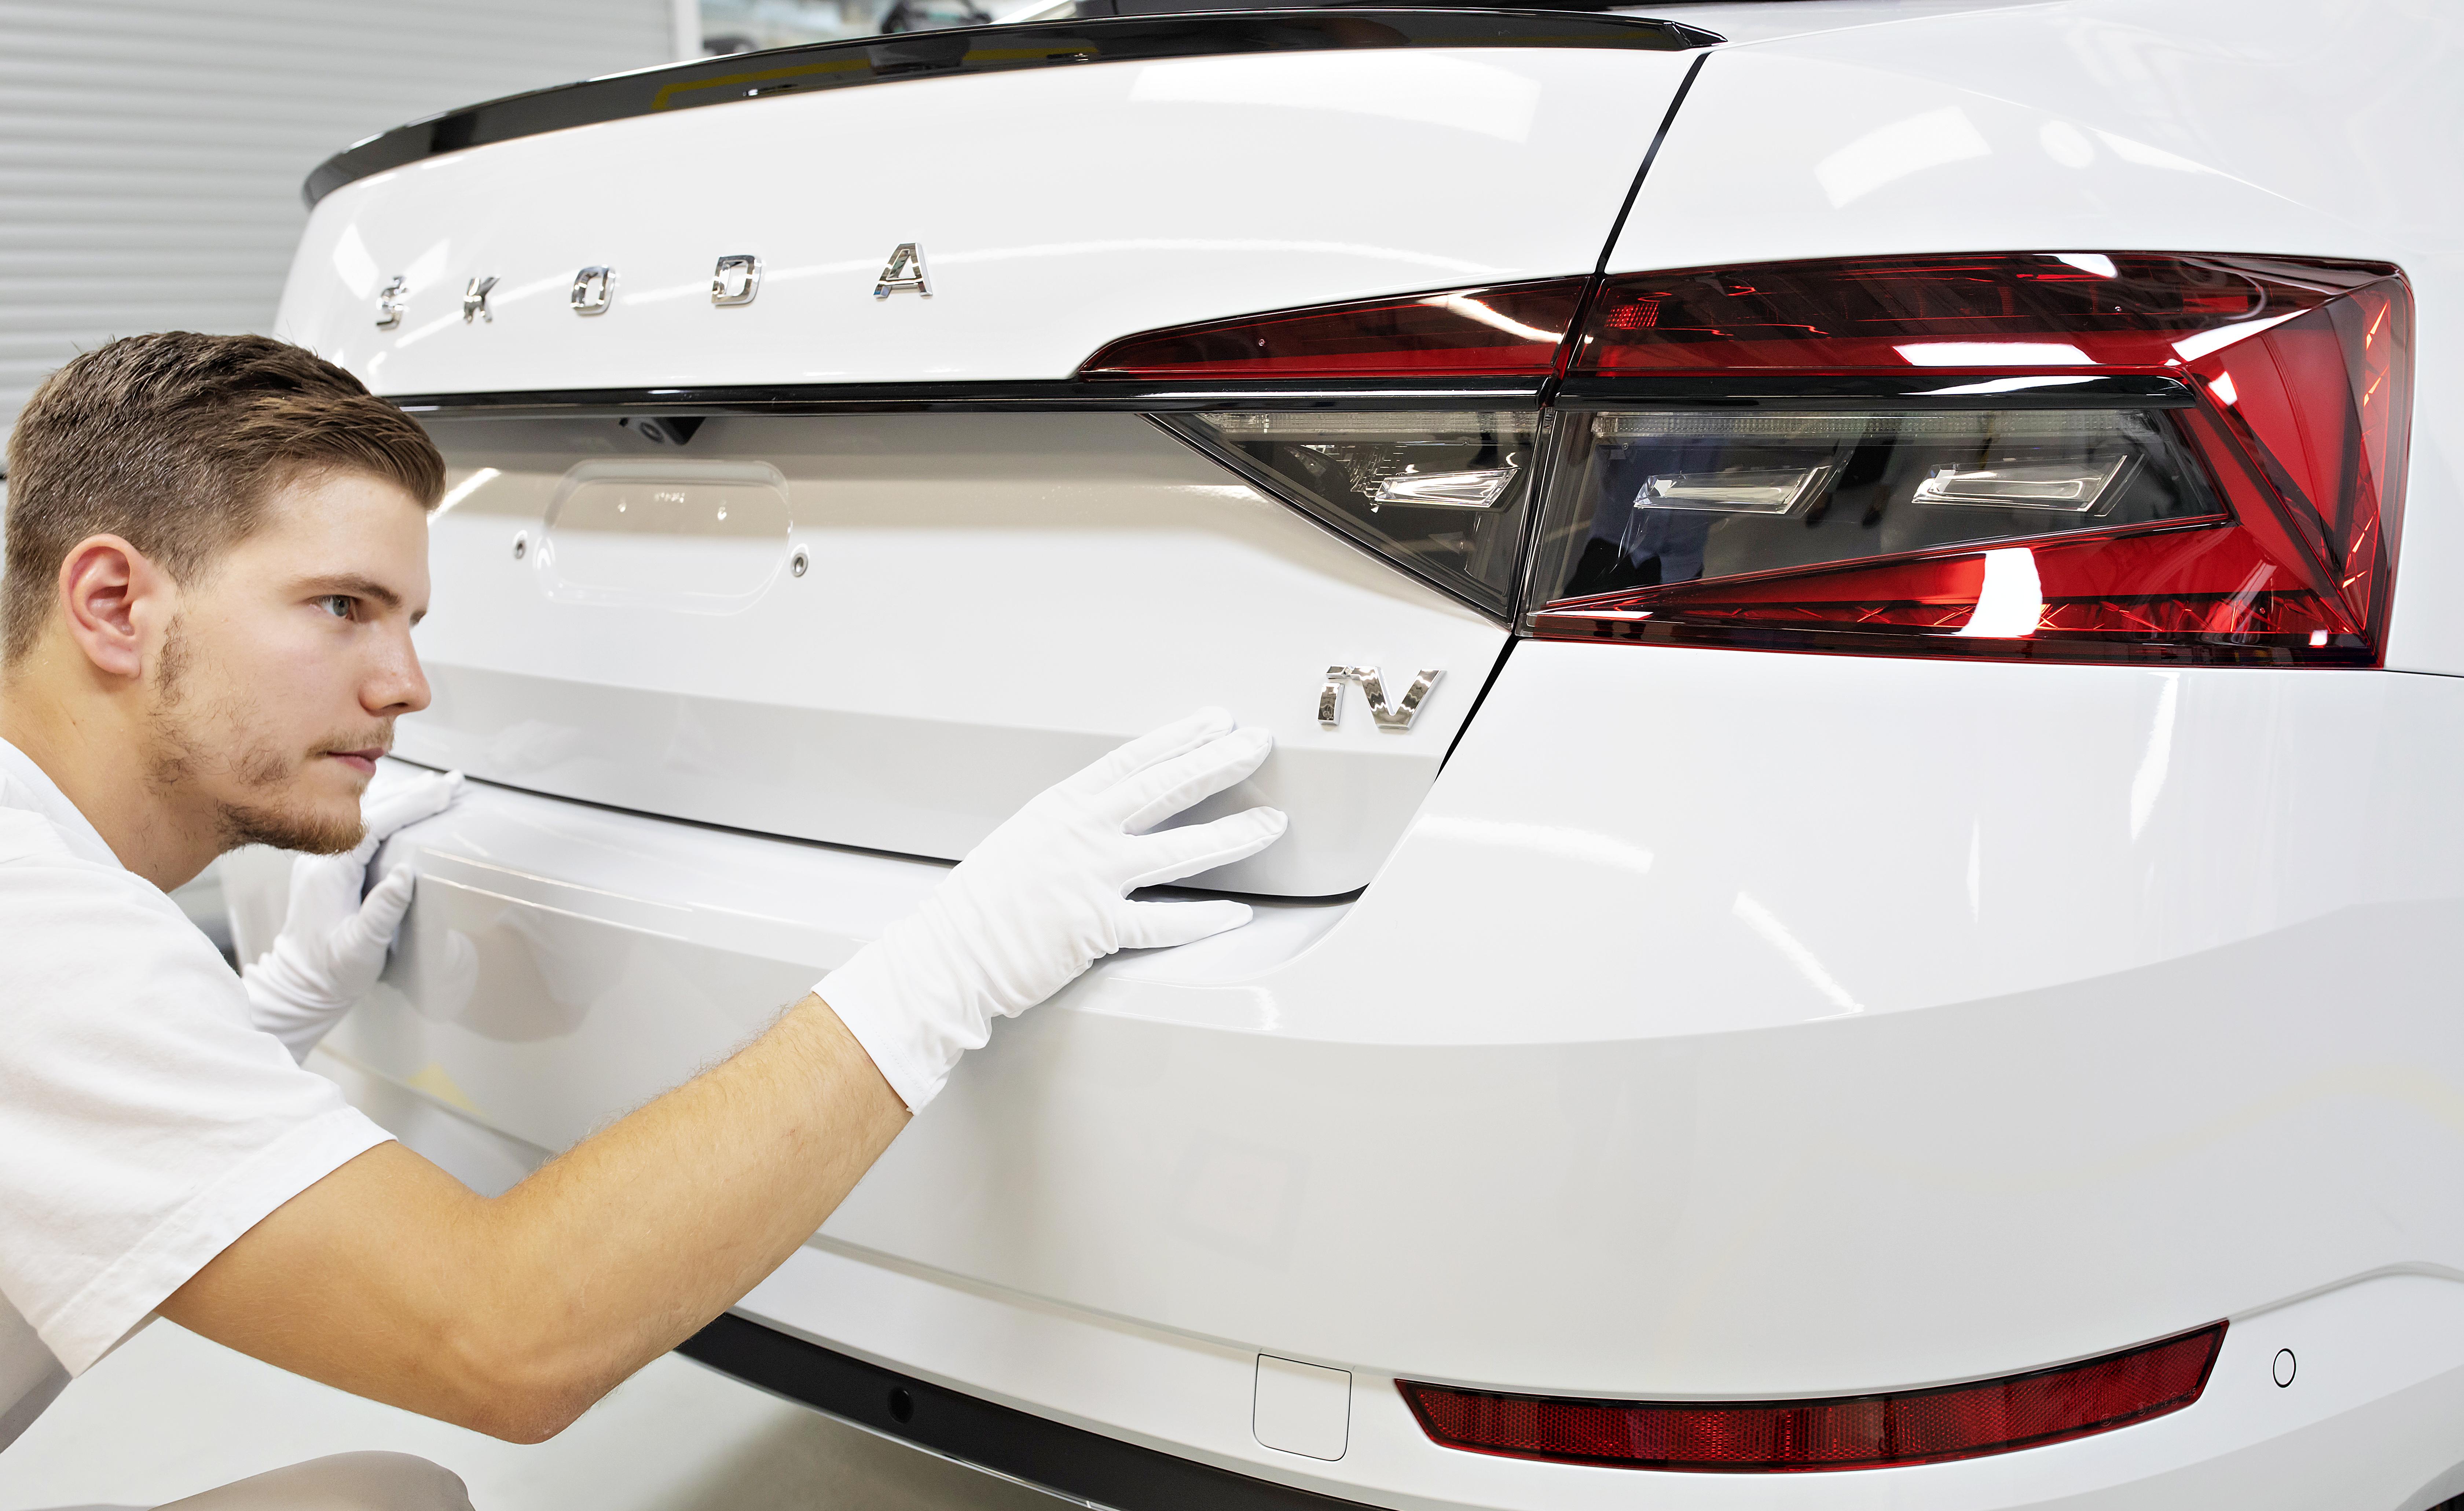 ŠKODA AUTO begins serial production of SUPERB iV at Kvasiny plant